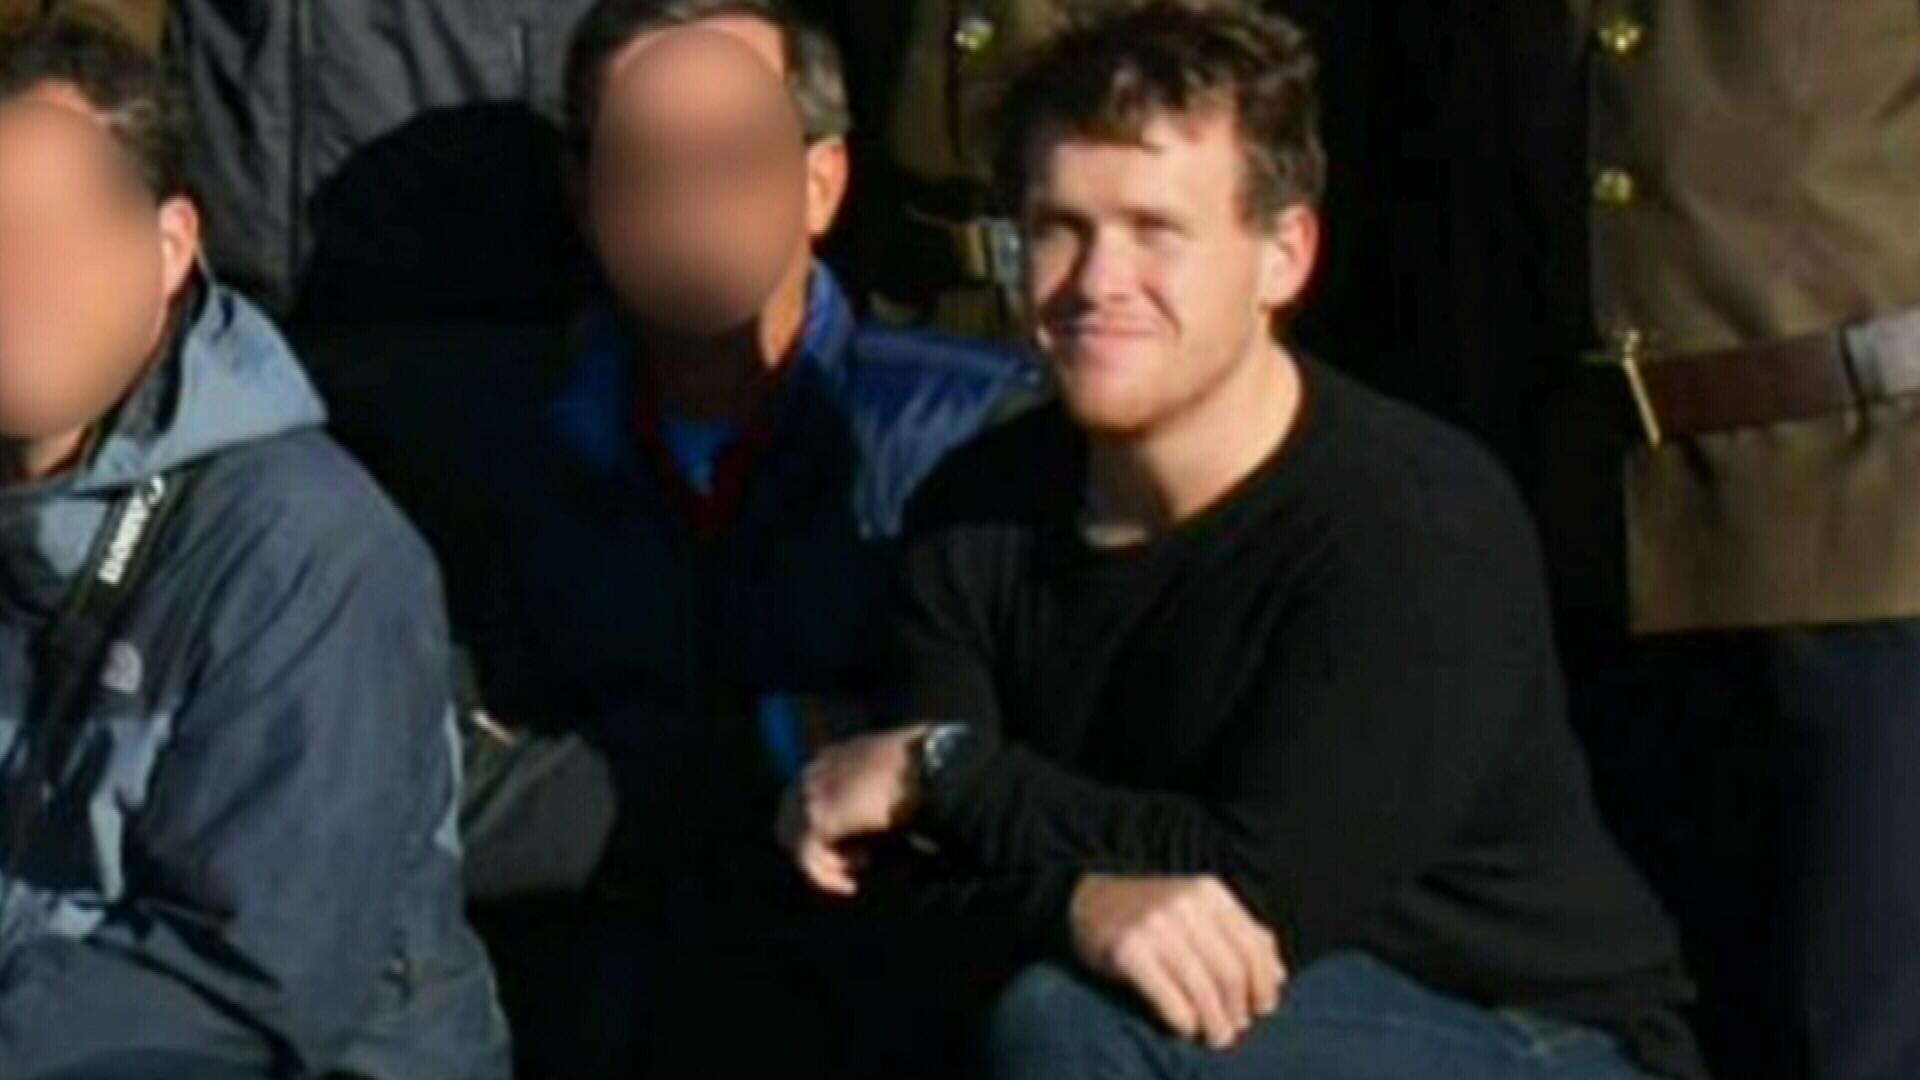 Christchurch terror attack: New Zealand gunman 'studied historical